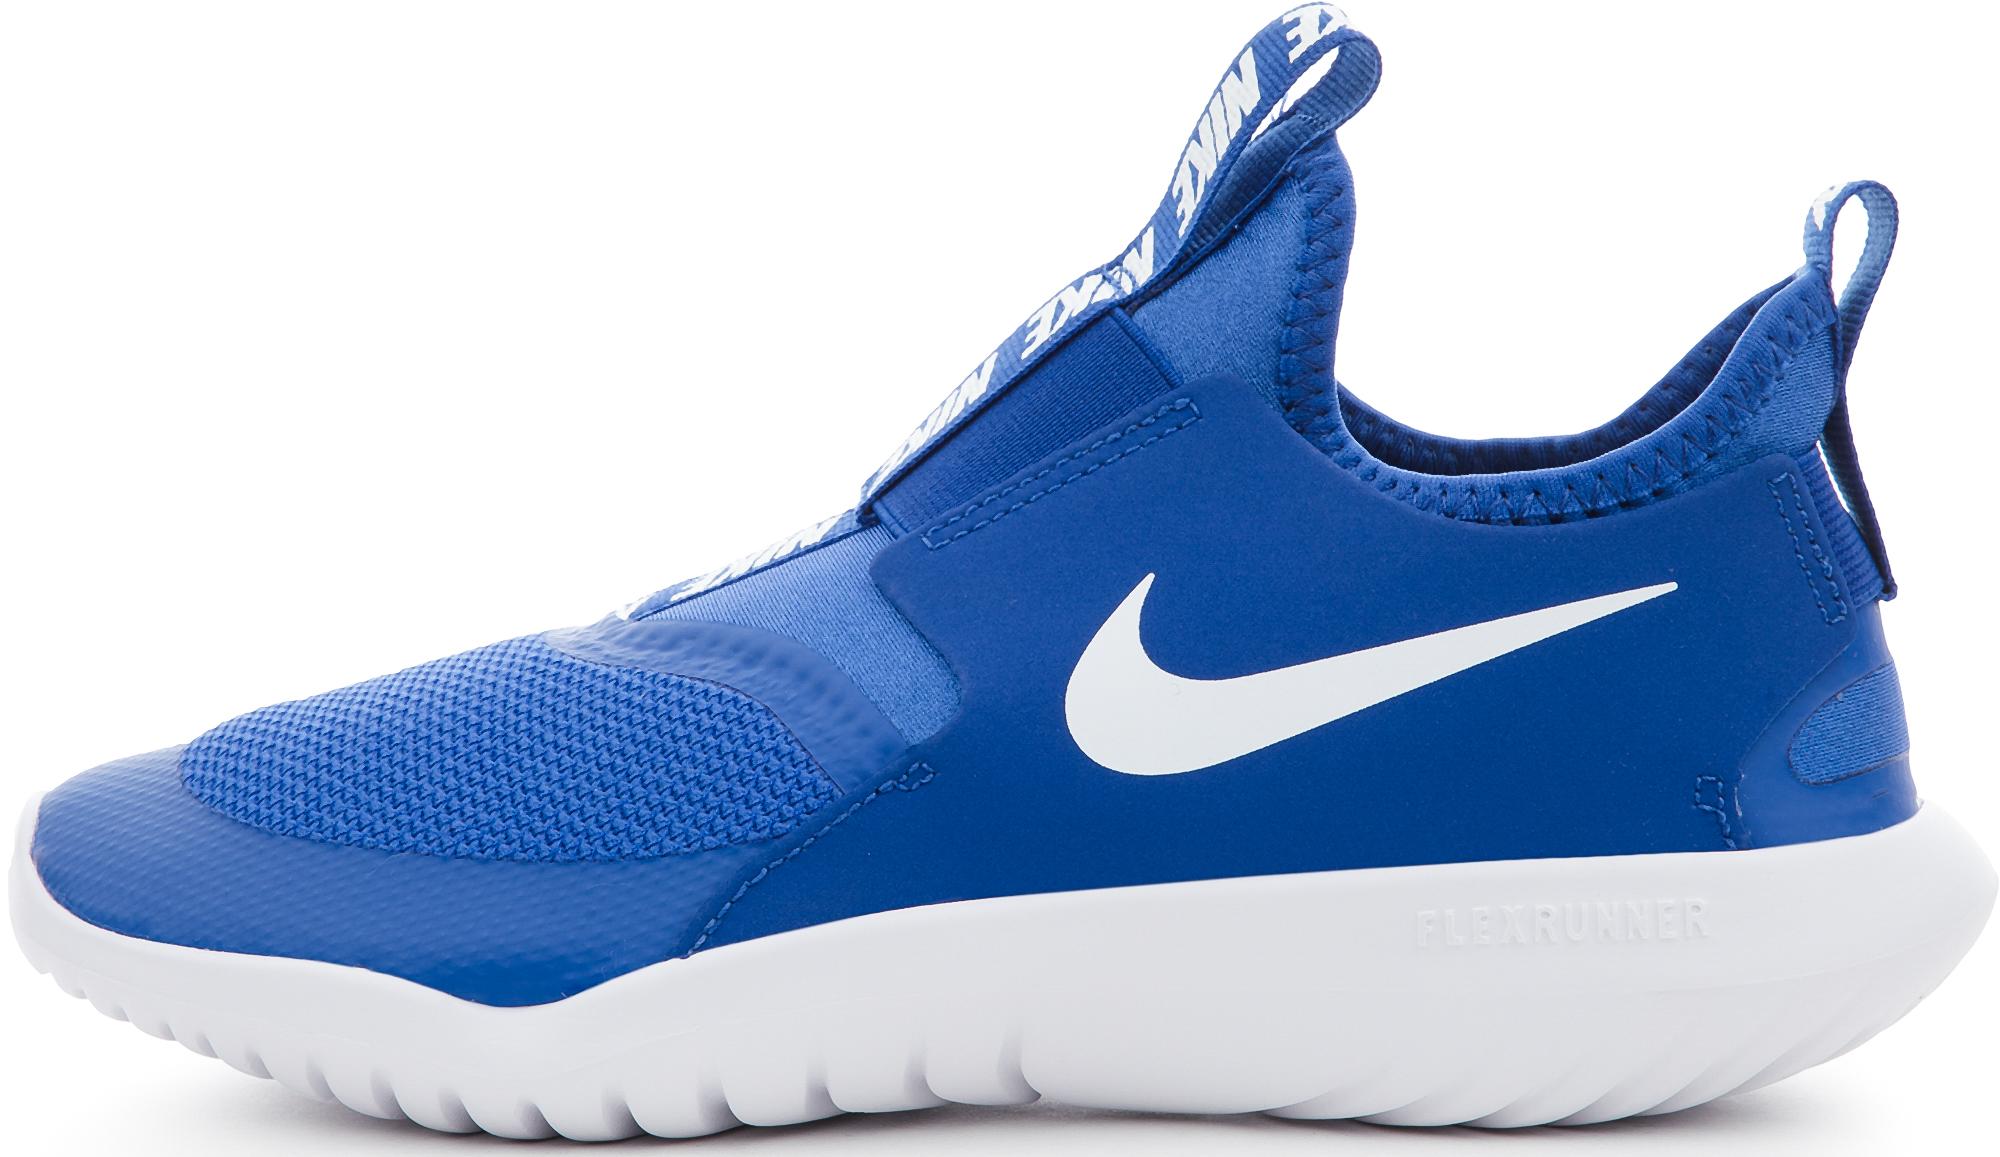 Nike Кроссовки для мальчиков Nike Flex Runner, размер 38 цена